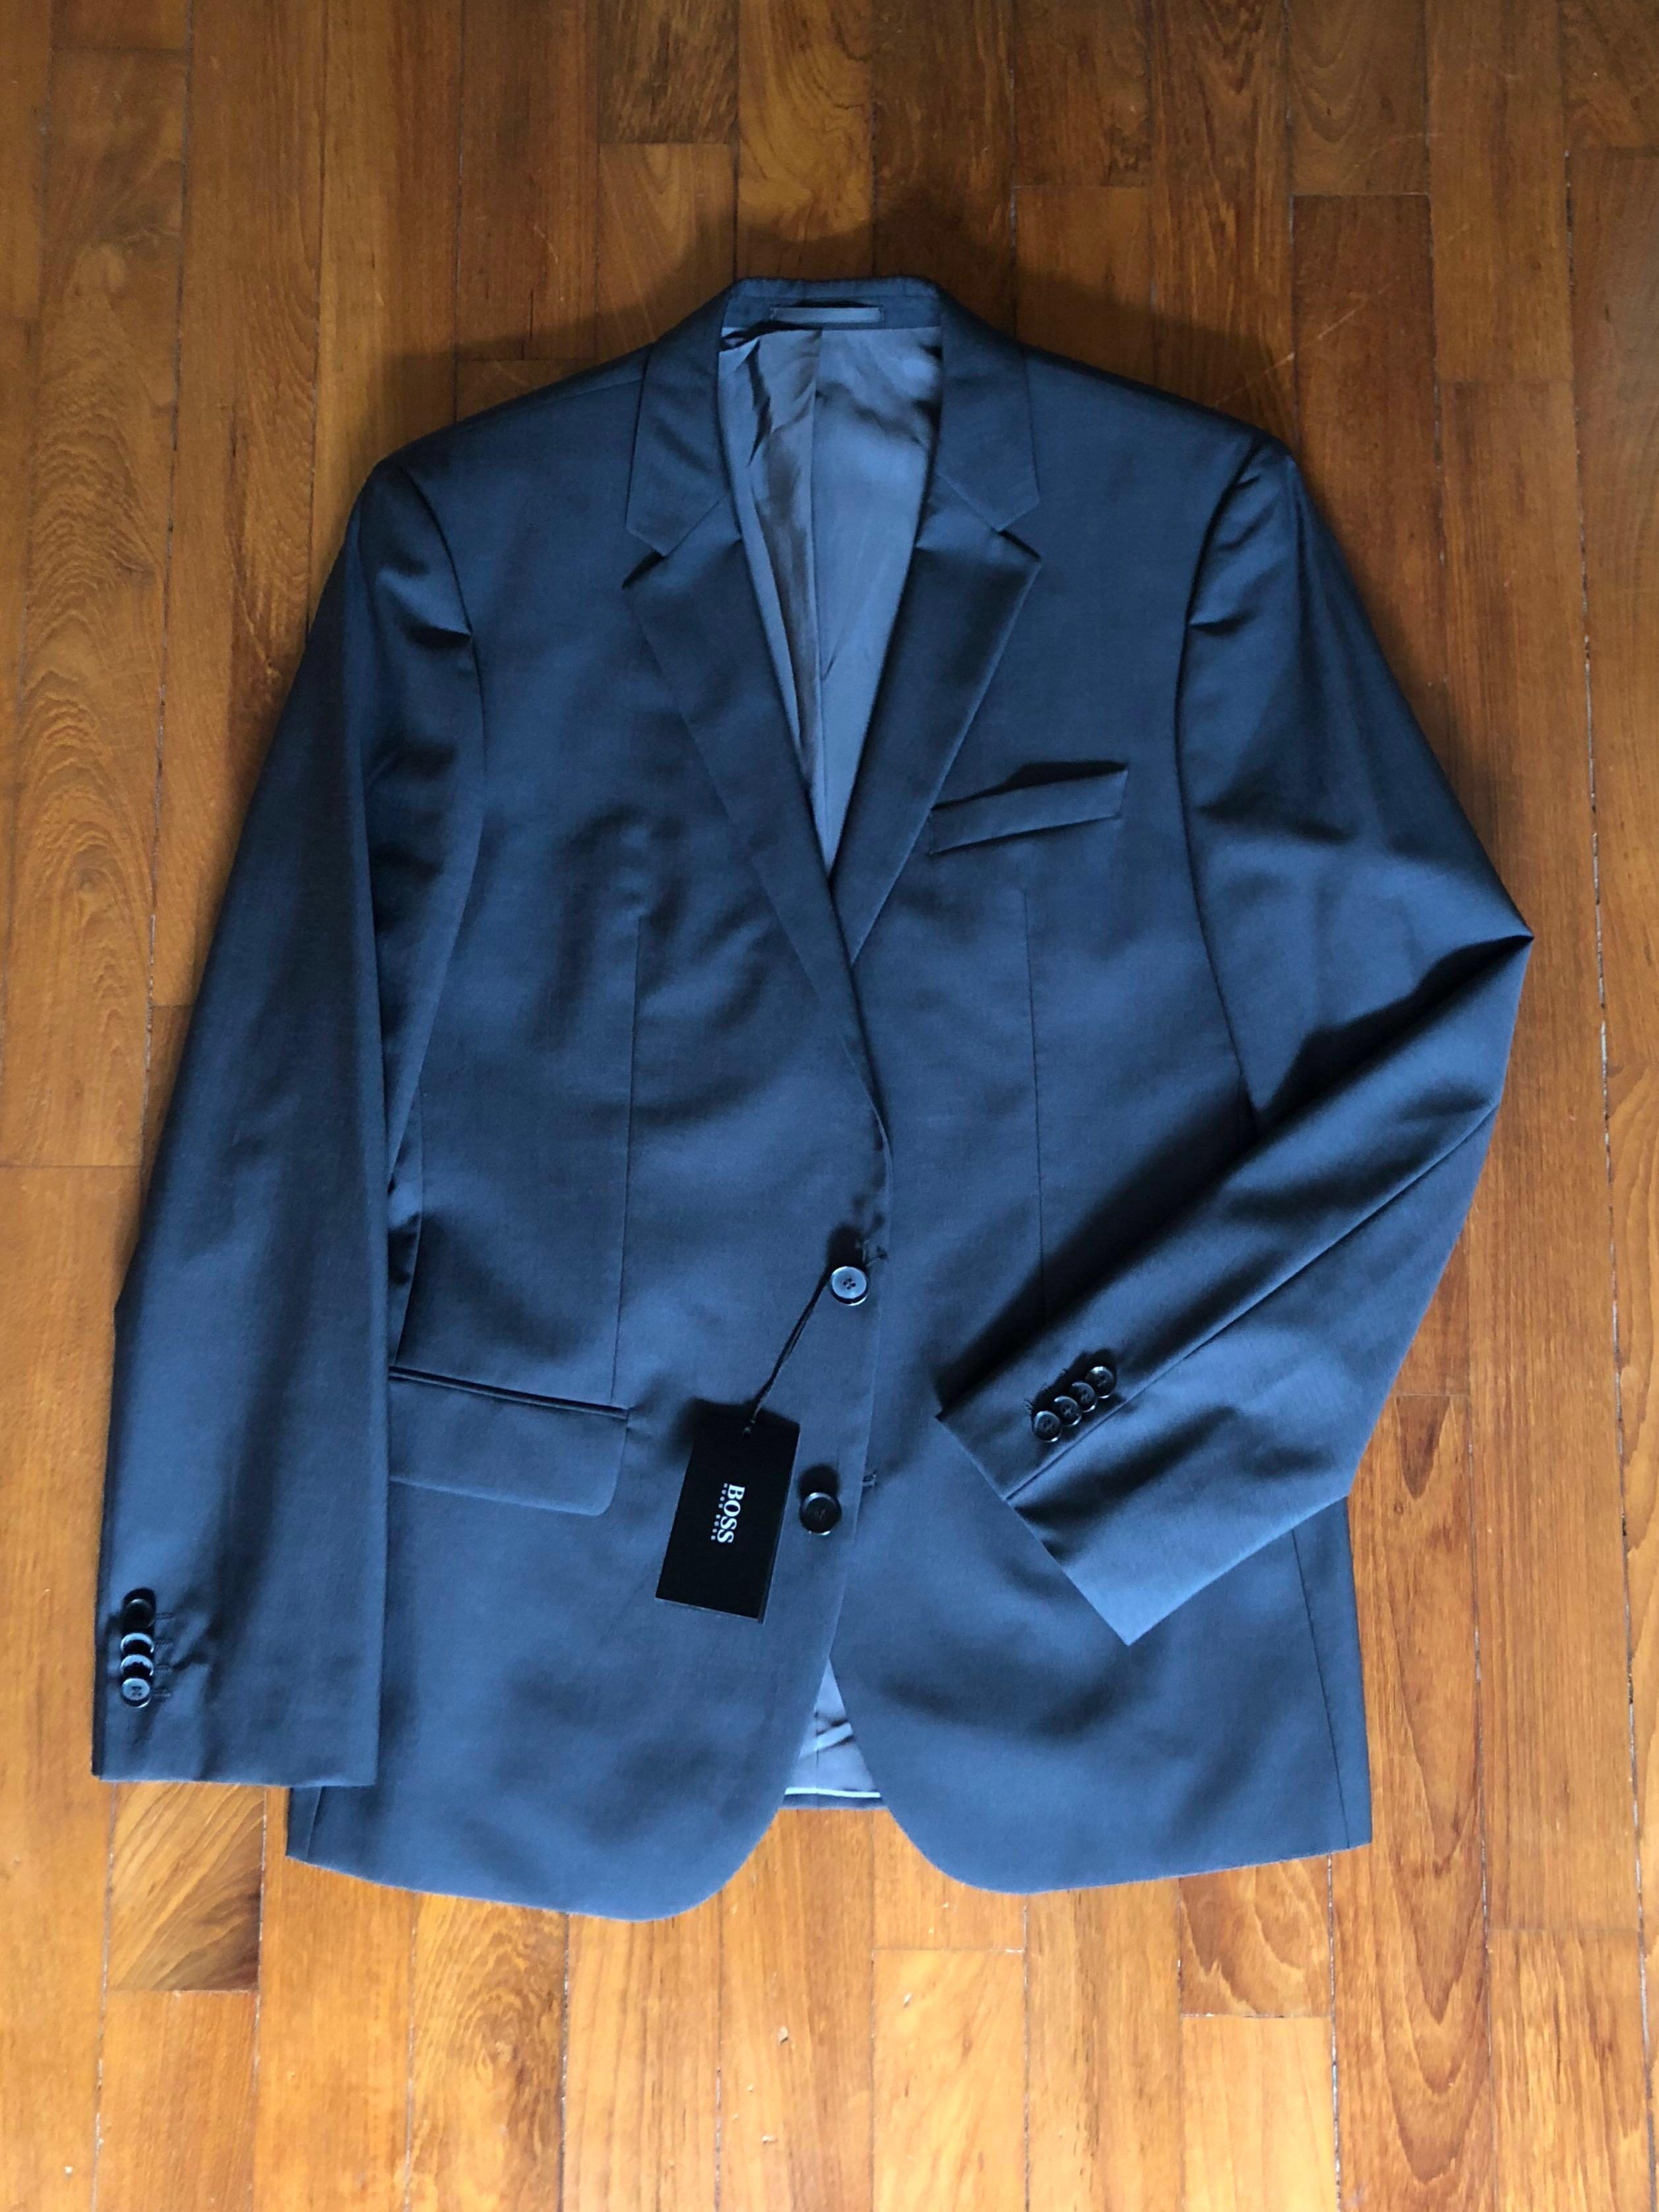 1b132e75 Hugo Boss Men's Dark Grey Two Button Suit *Price Reduced!*, Men's ...